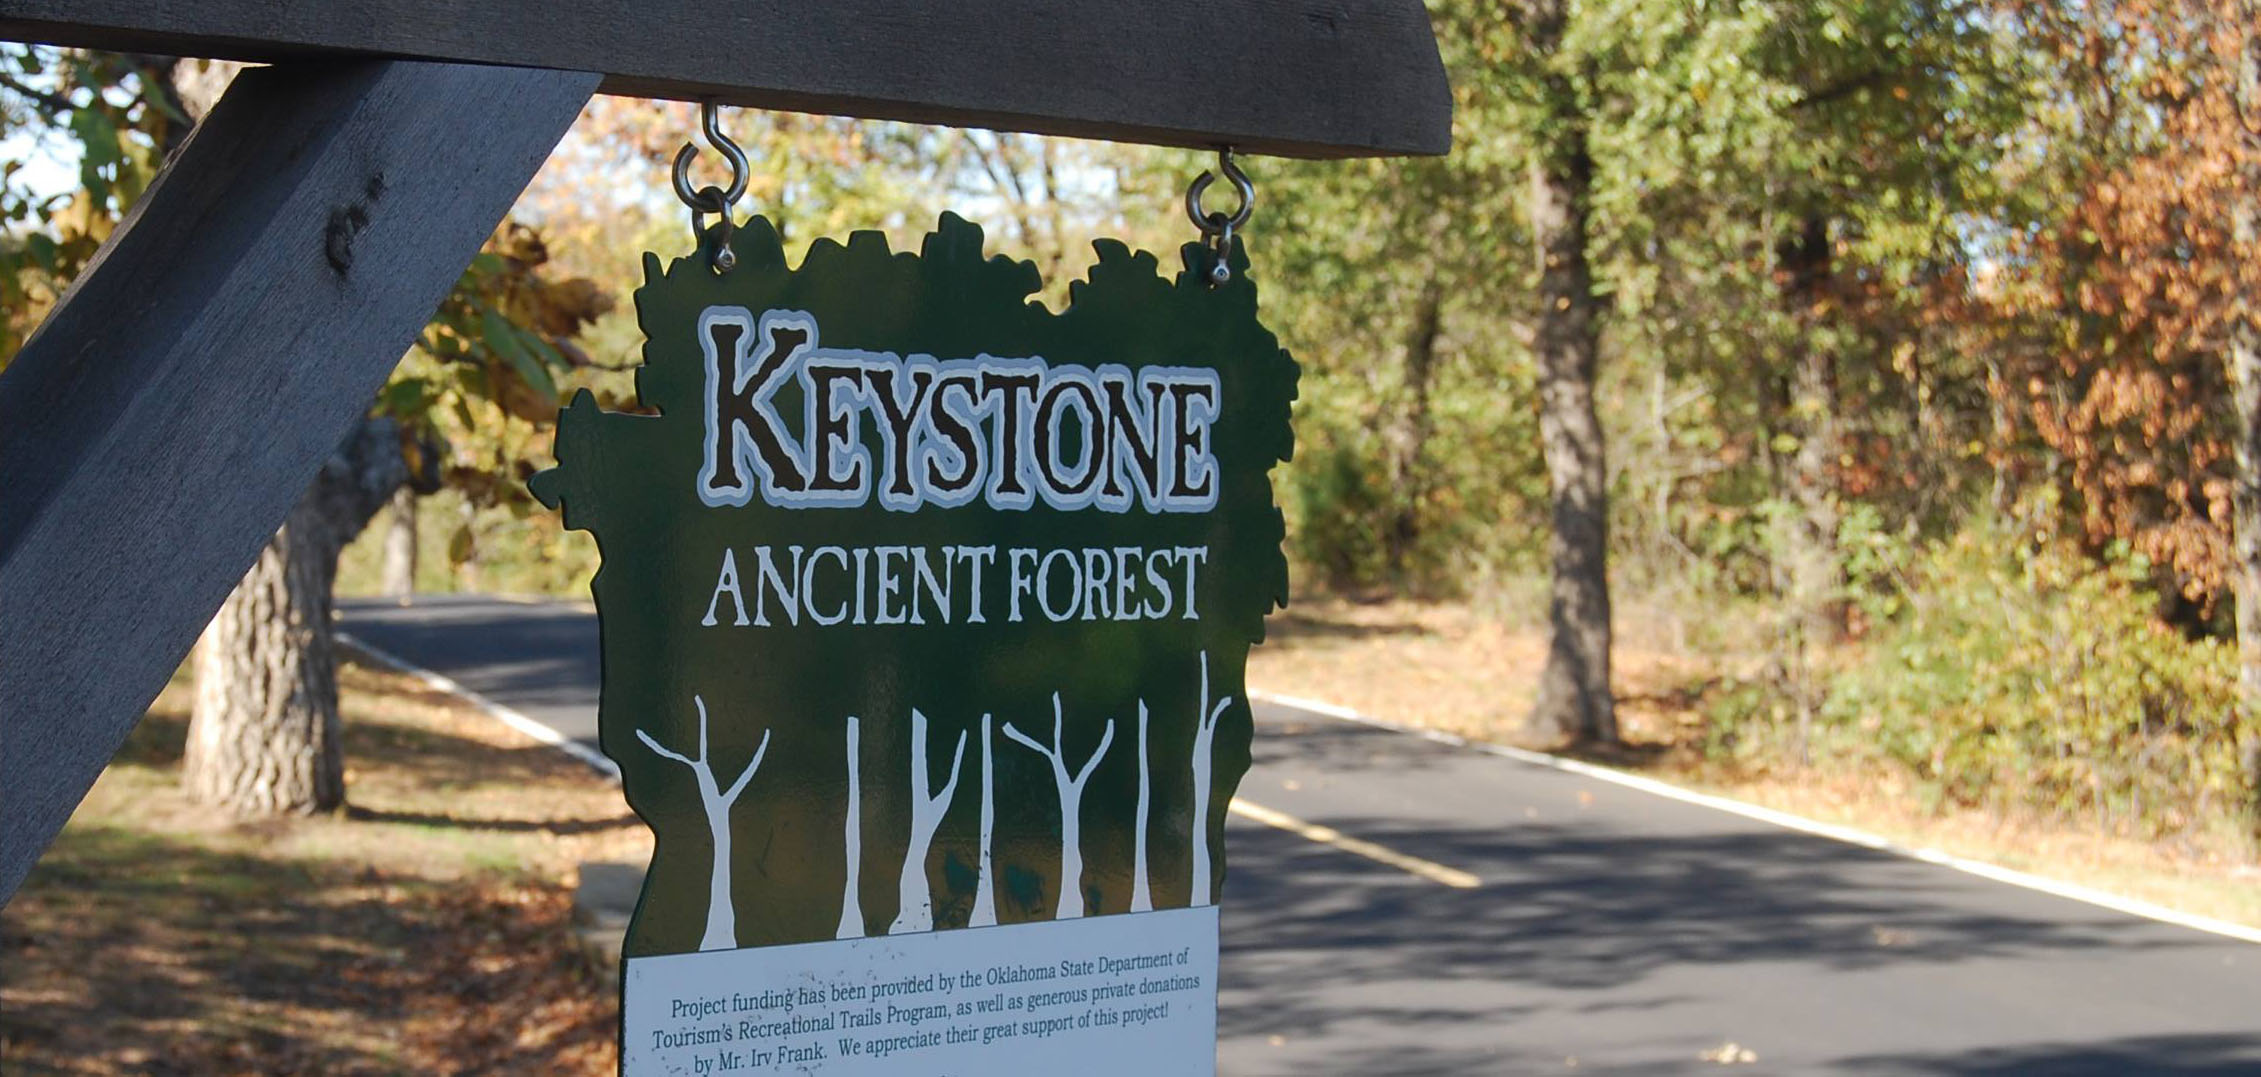 Warm light on a fall day at Keystone Ancient Forest near Tulsa, Oklahoma.